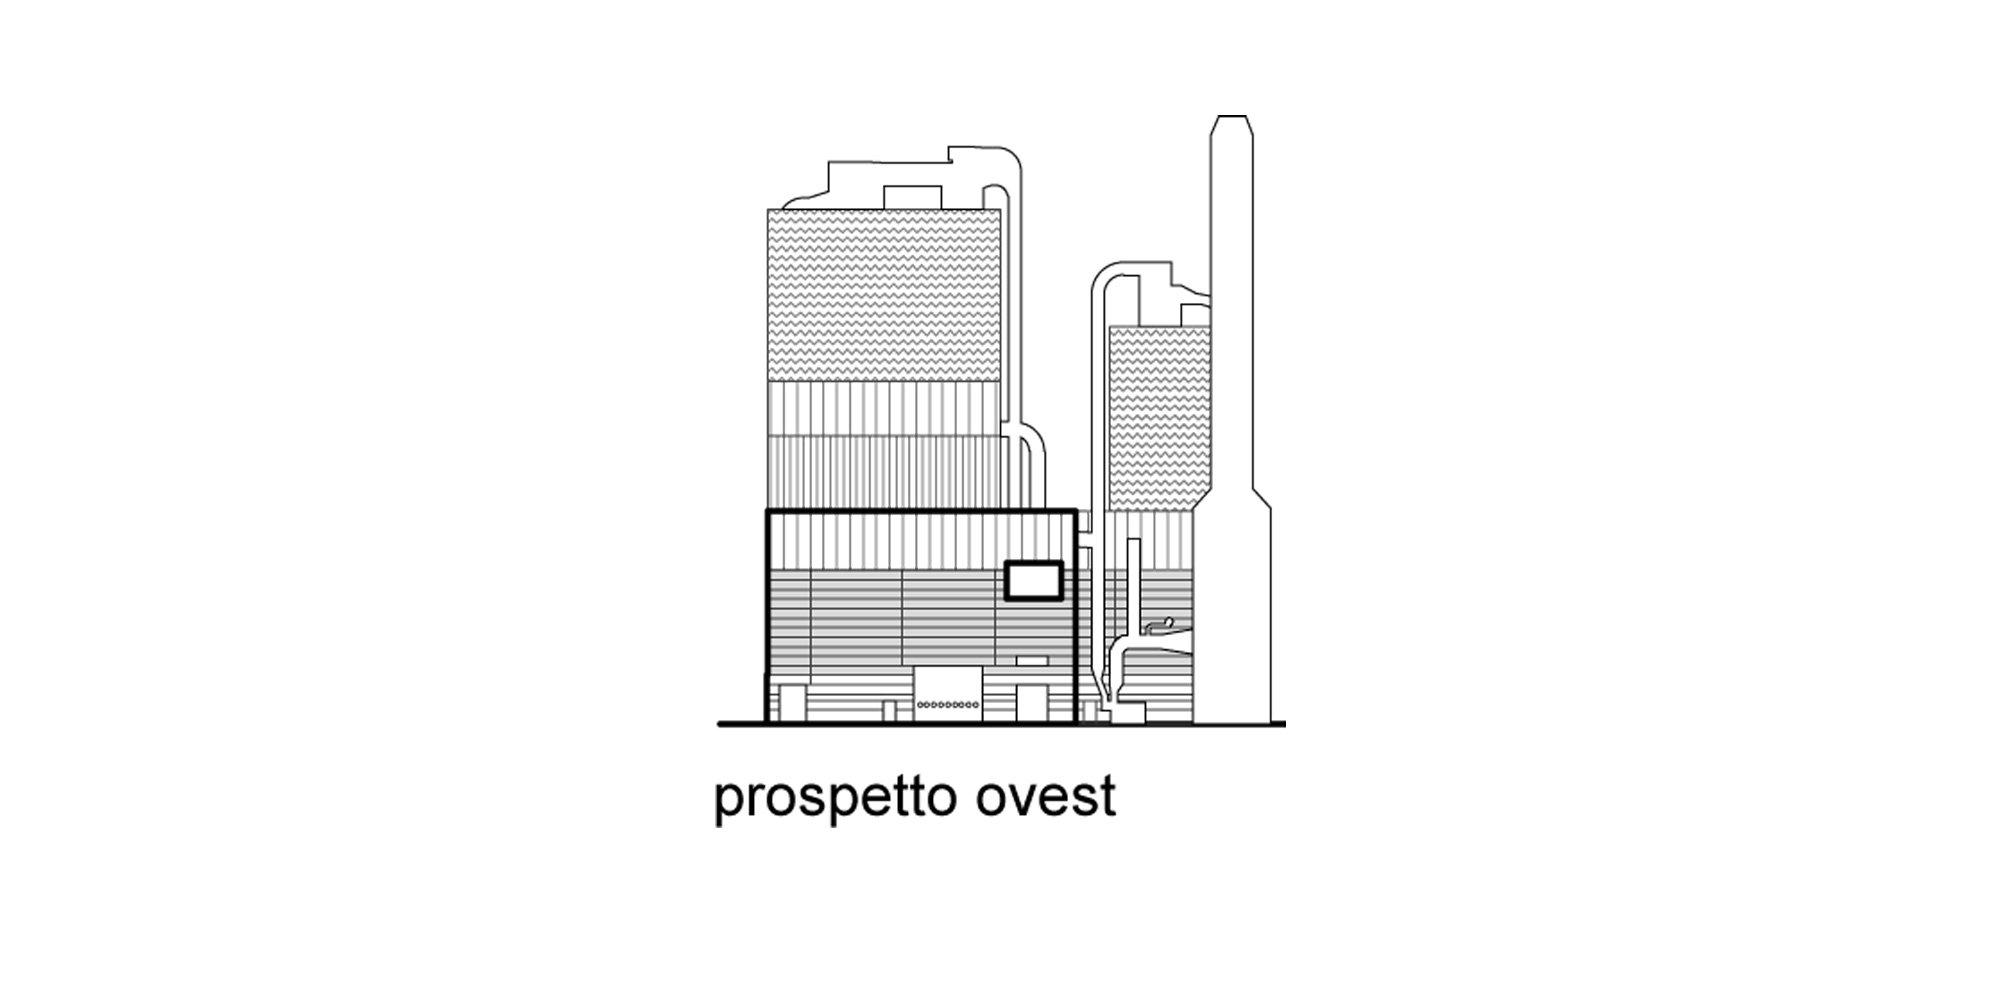 Prospetto ovest © Valle Architetti Associati